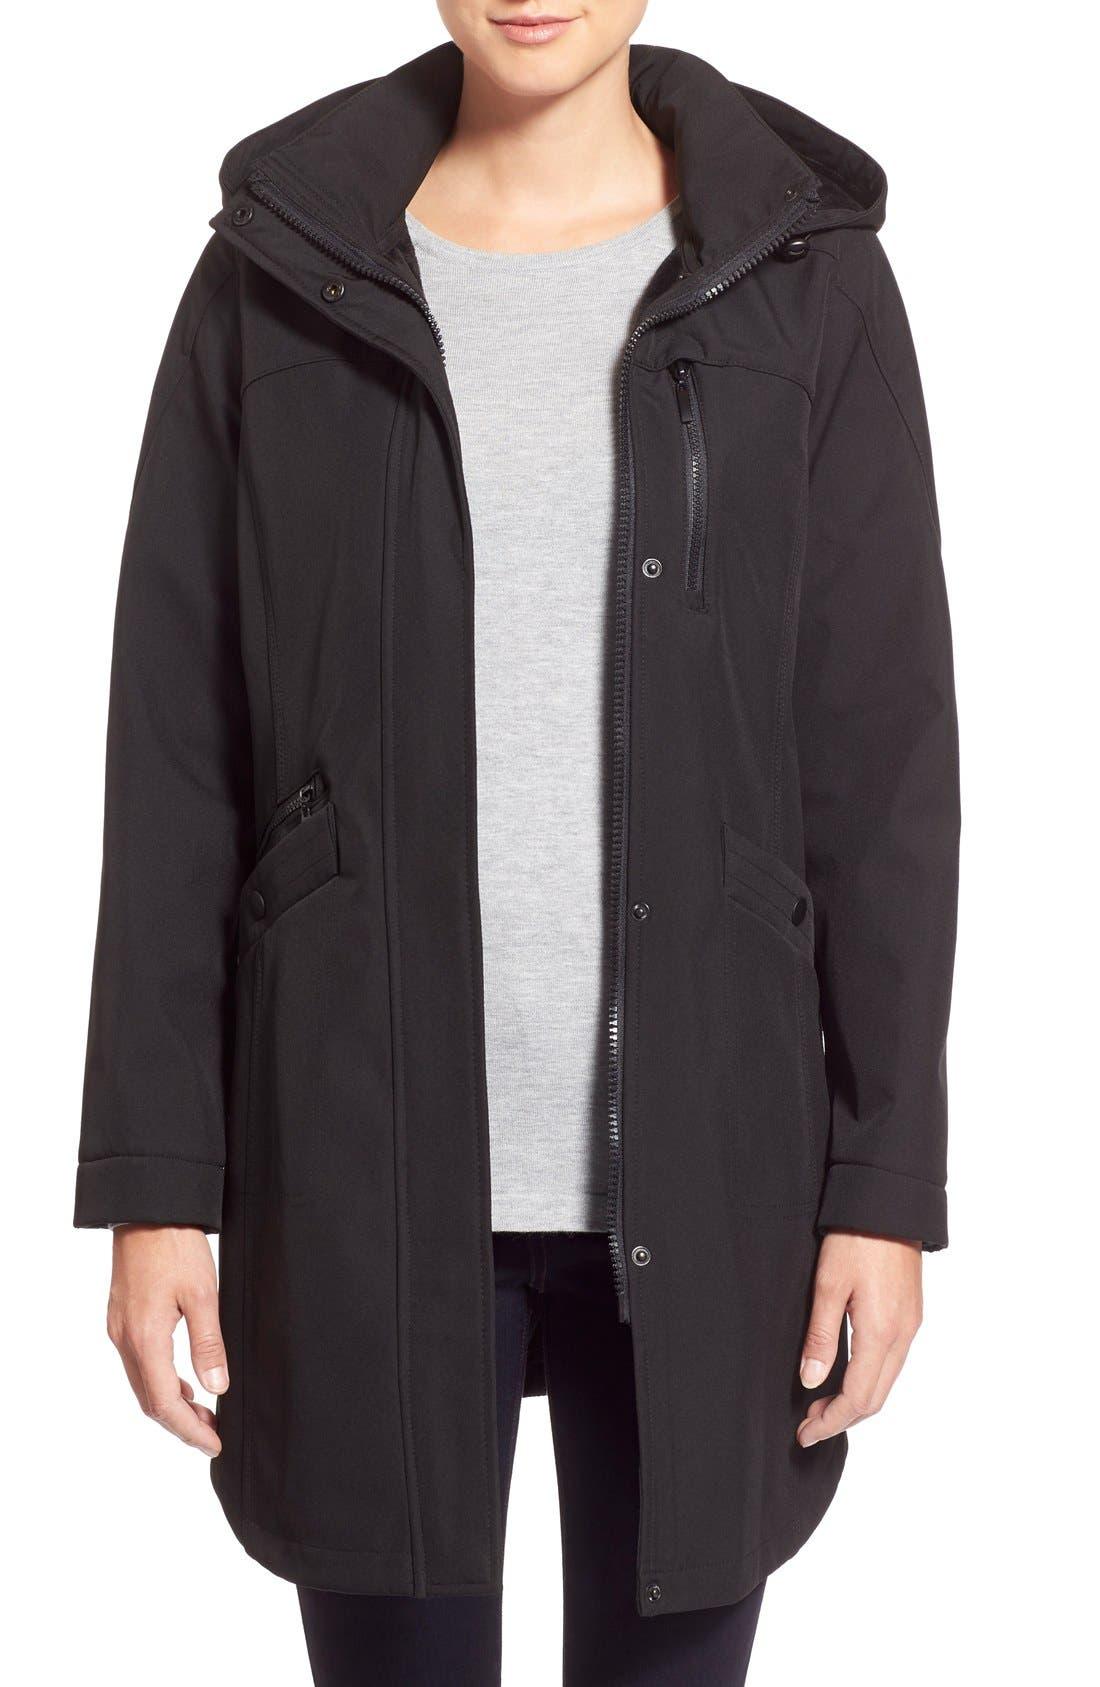 Main Image - Kristen Blake Crossdye Hooded Soft Shell Jacket(Regular &Petite)